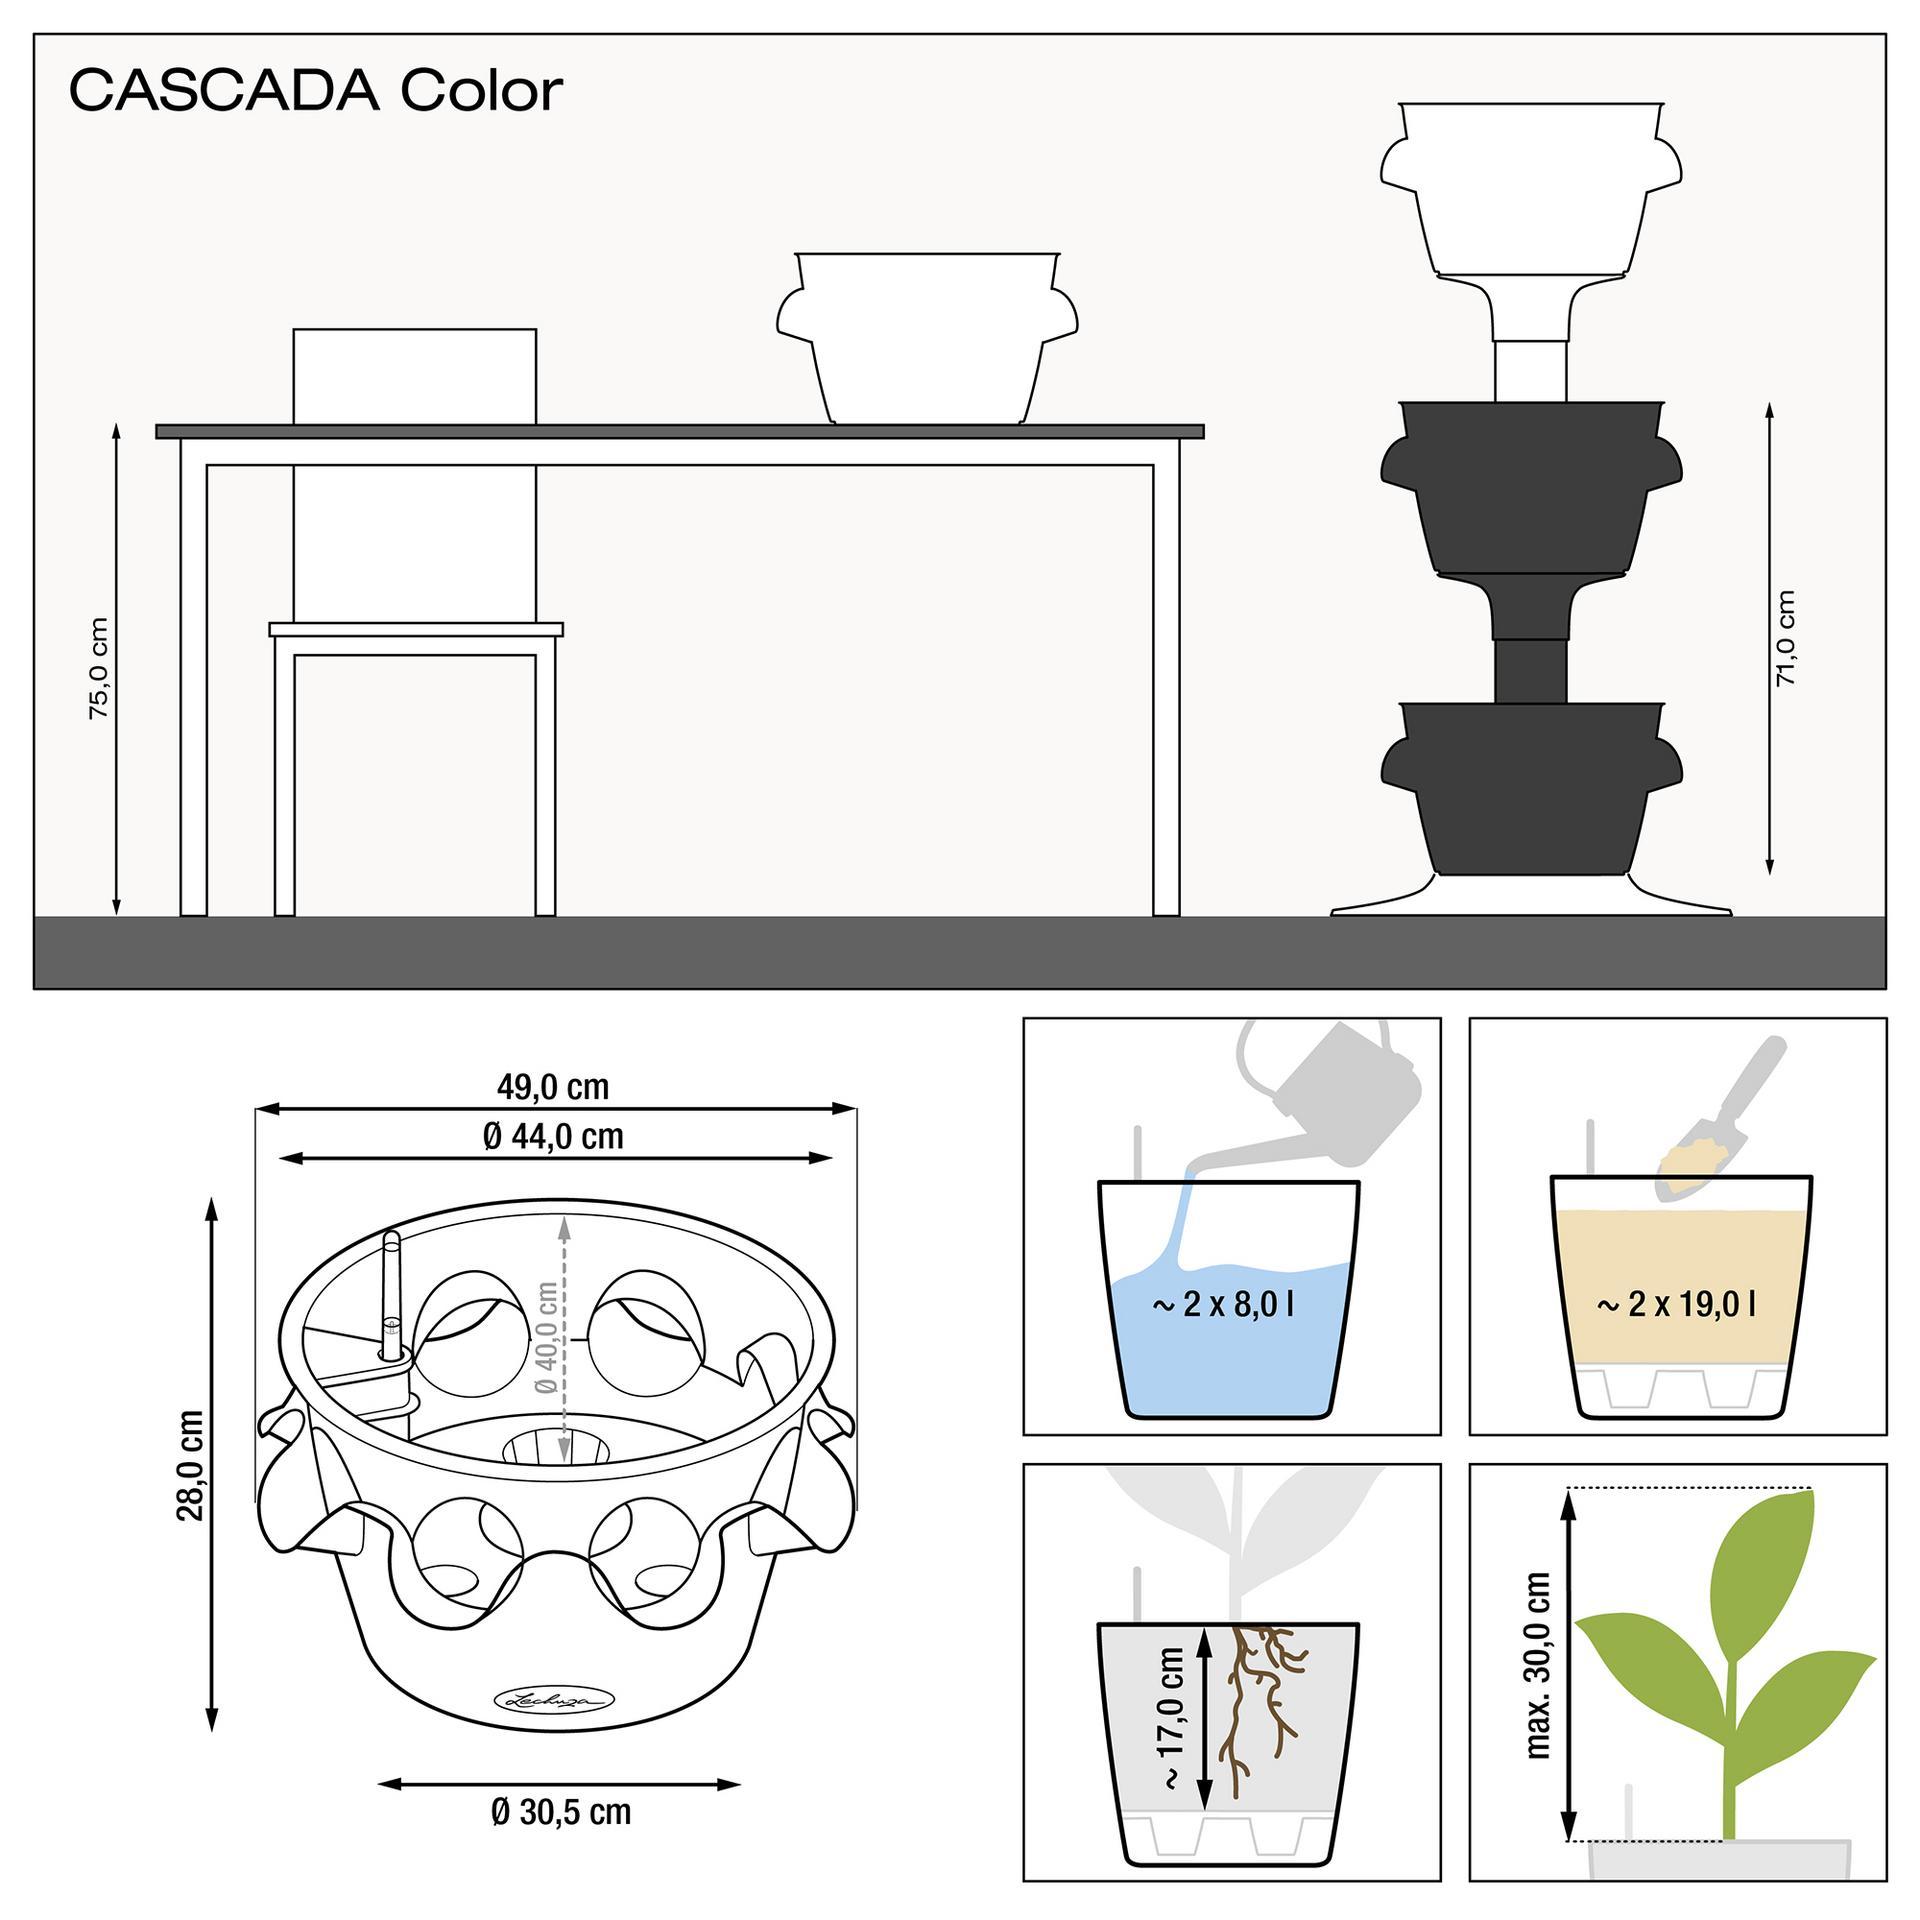 le_cascada-color49-2_product_addi_nz